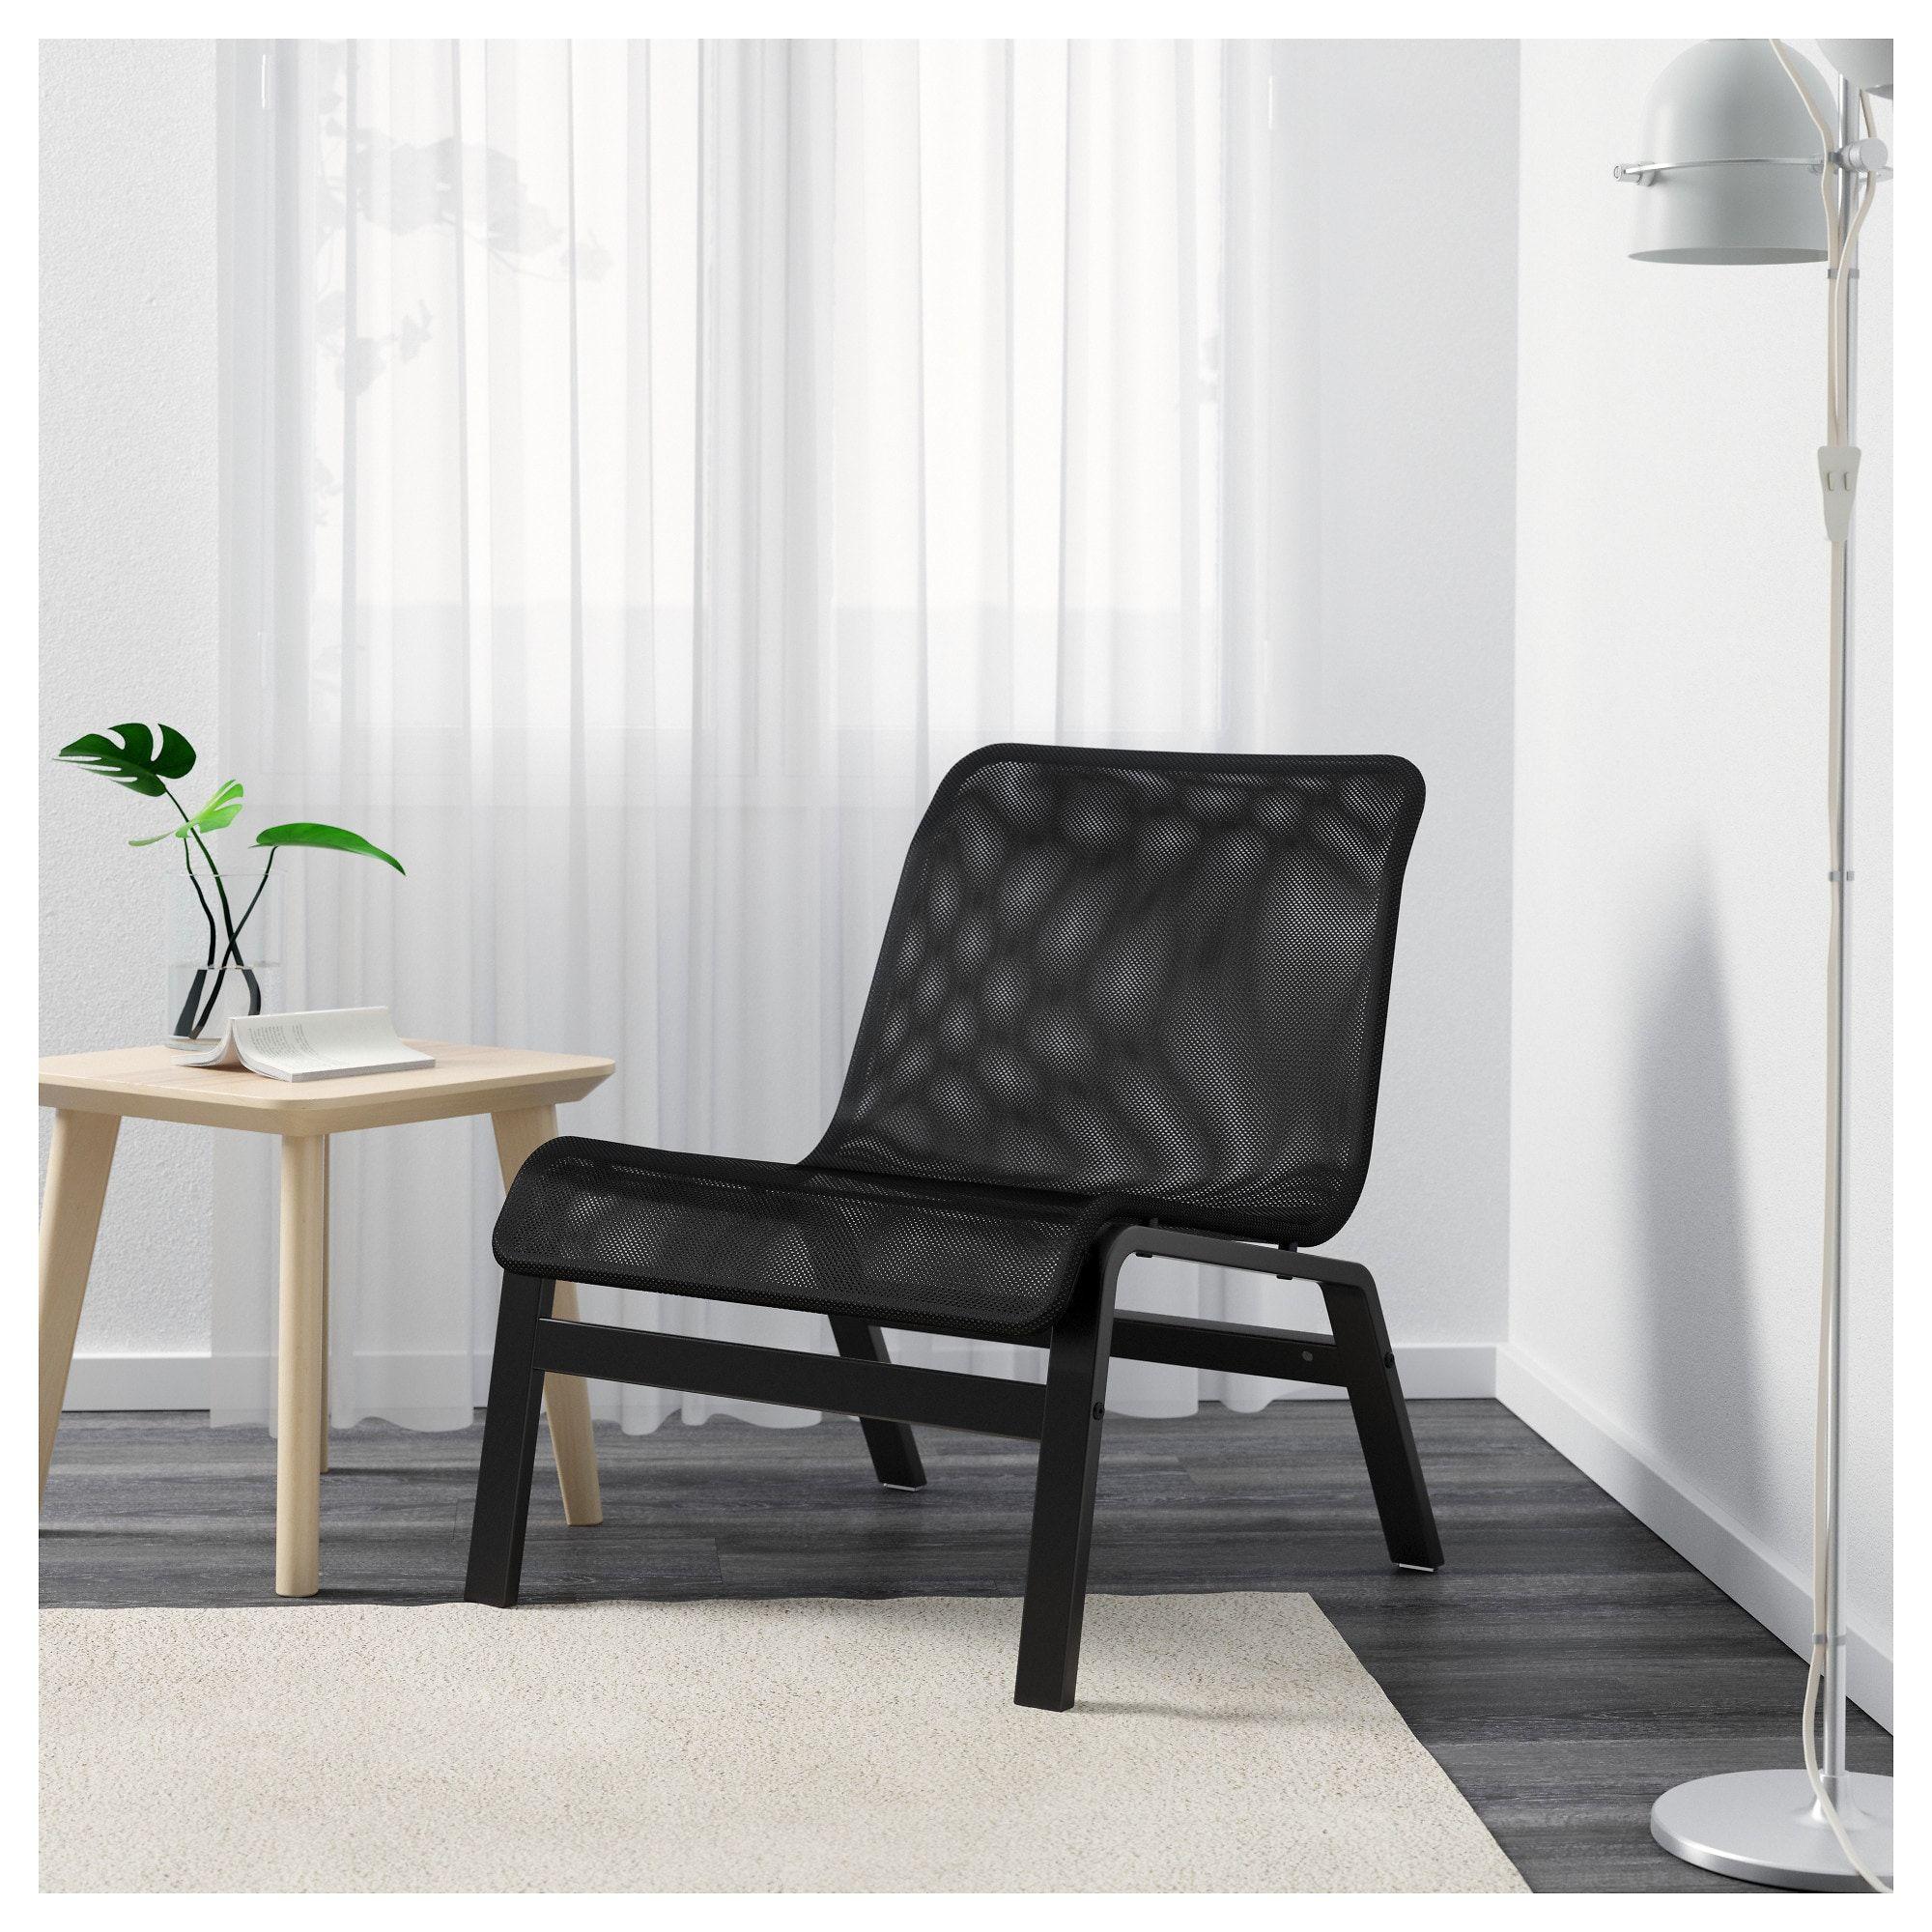 NOLMYRA Easy chair black, black IKEA Furniture